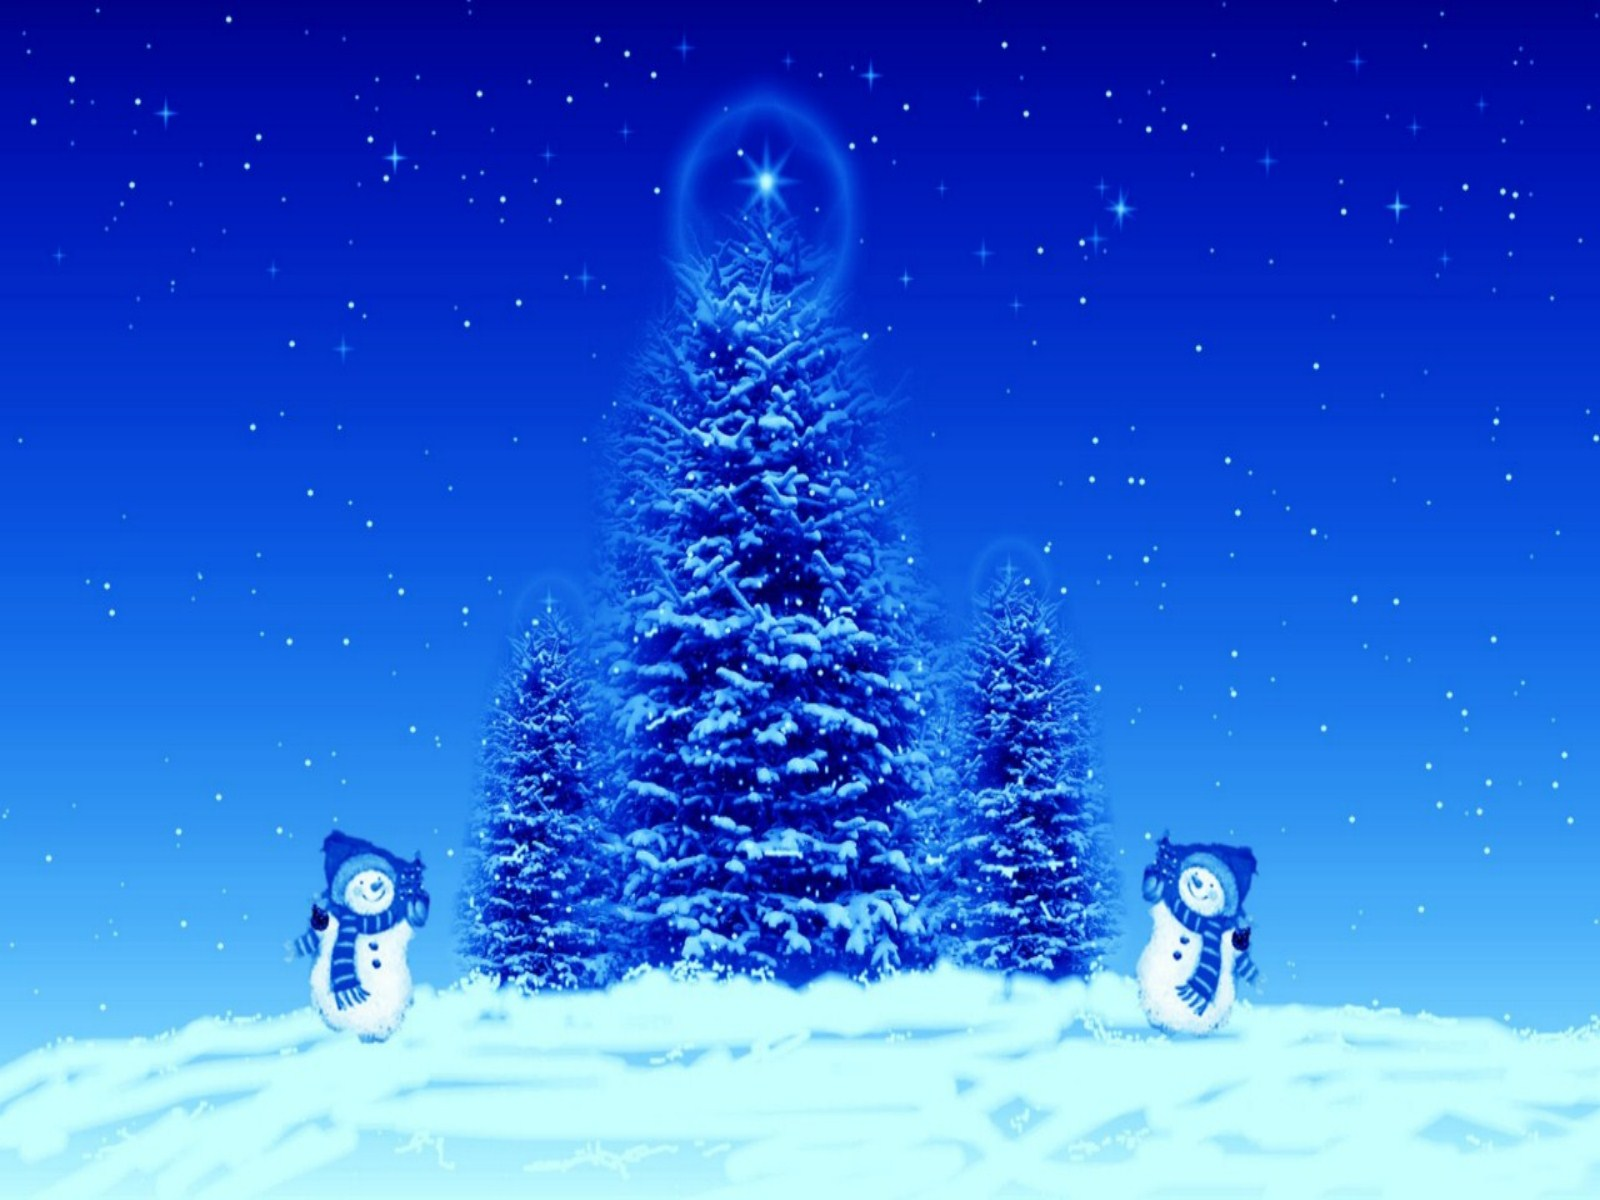 Microsoft Christmas Wallpaper